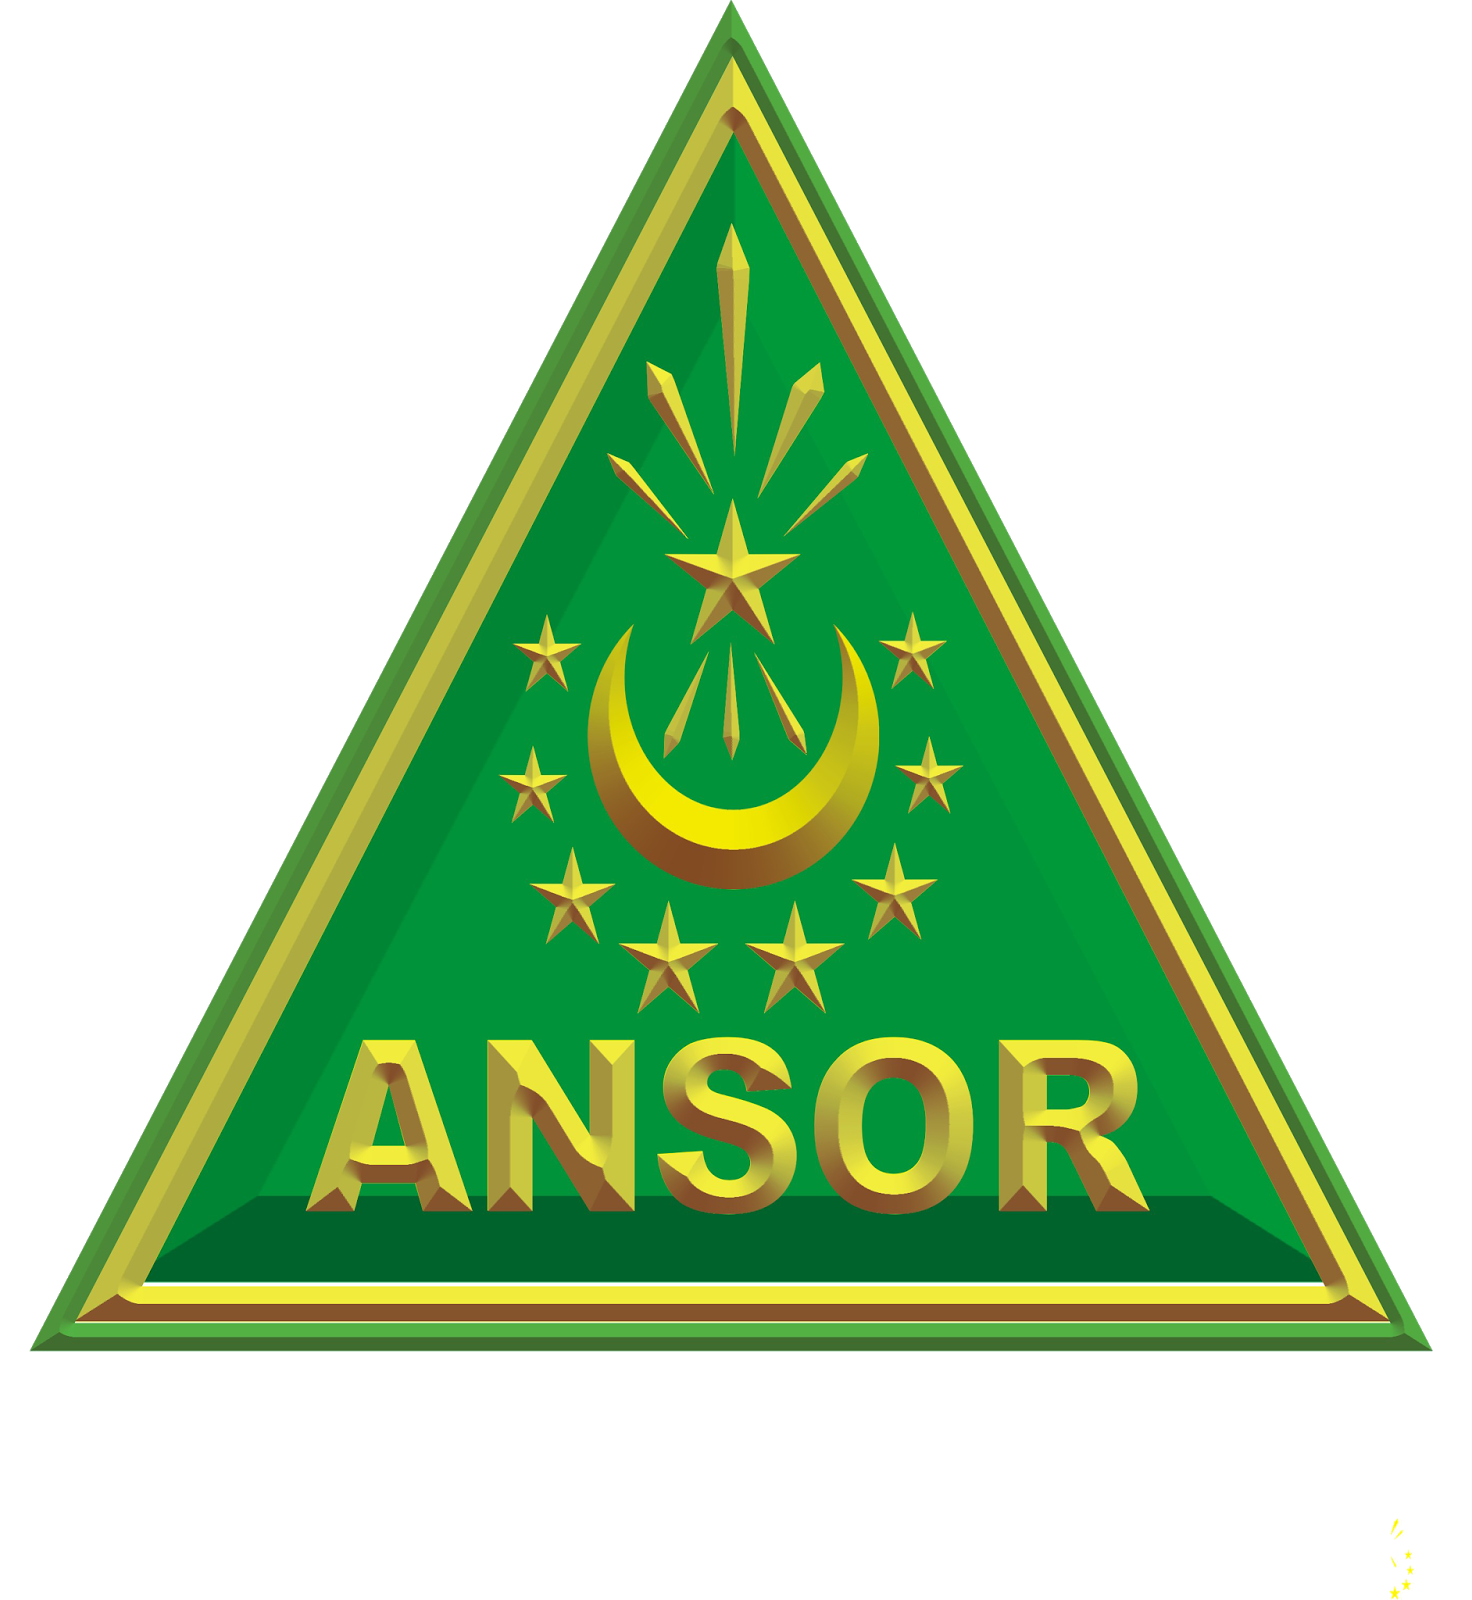 Logo gp ansor png 7 » PNG Image.